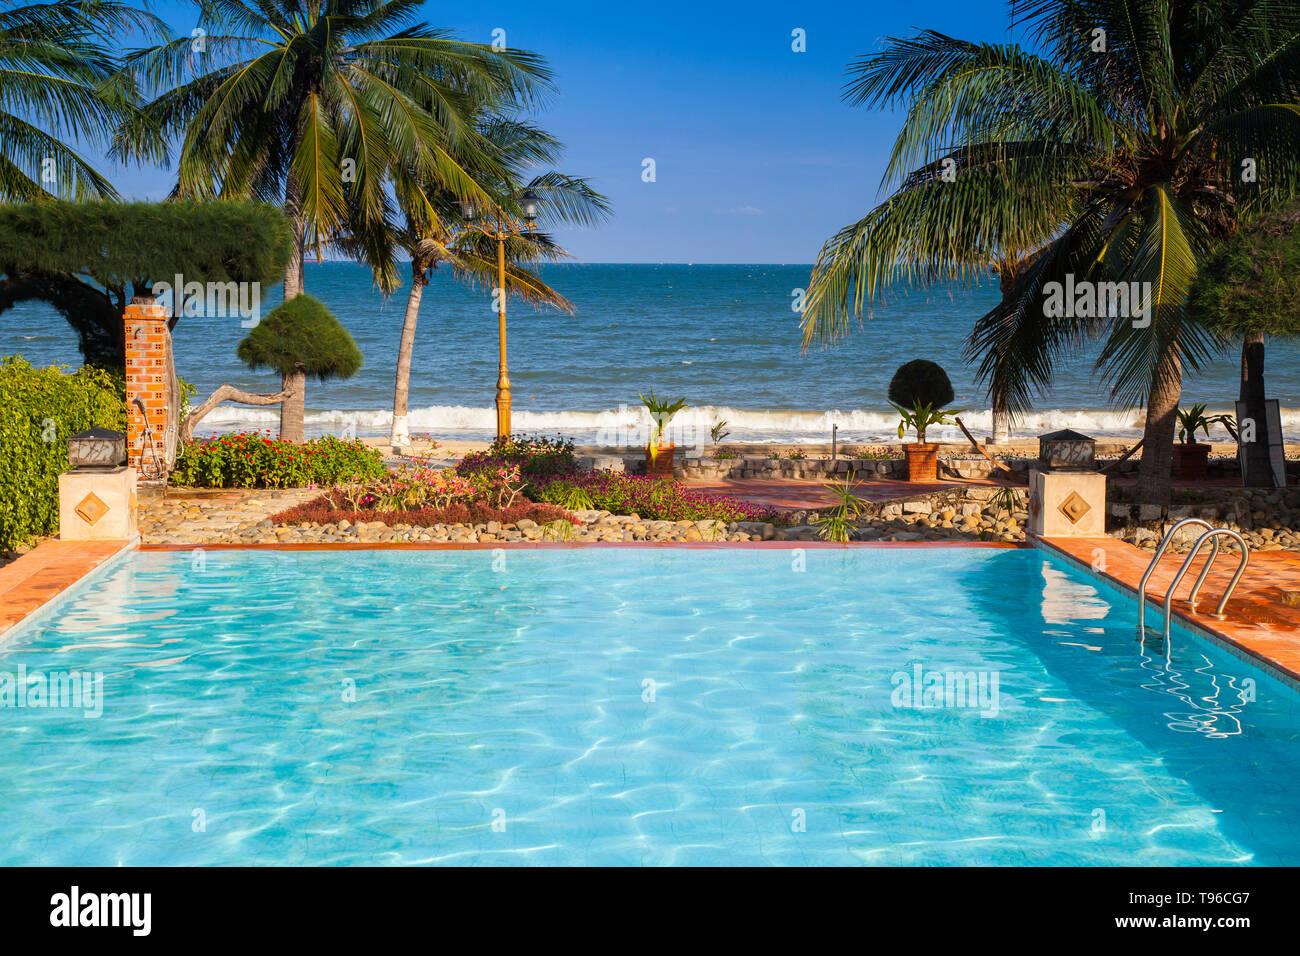 Swimmimgpool at TTC Resort, South China Sea,Phan Rang, Ninh Thuan,Vietnam, Asia - Stock Image